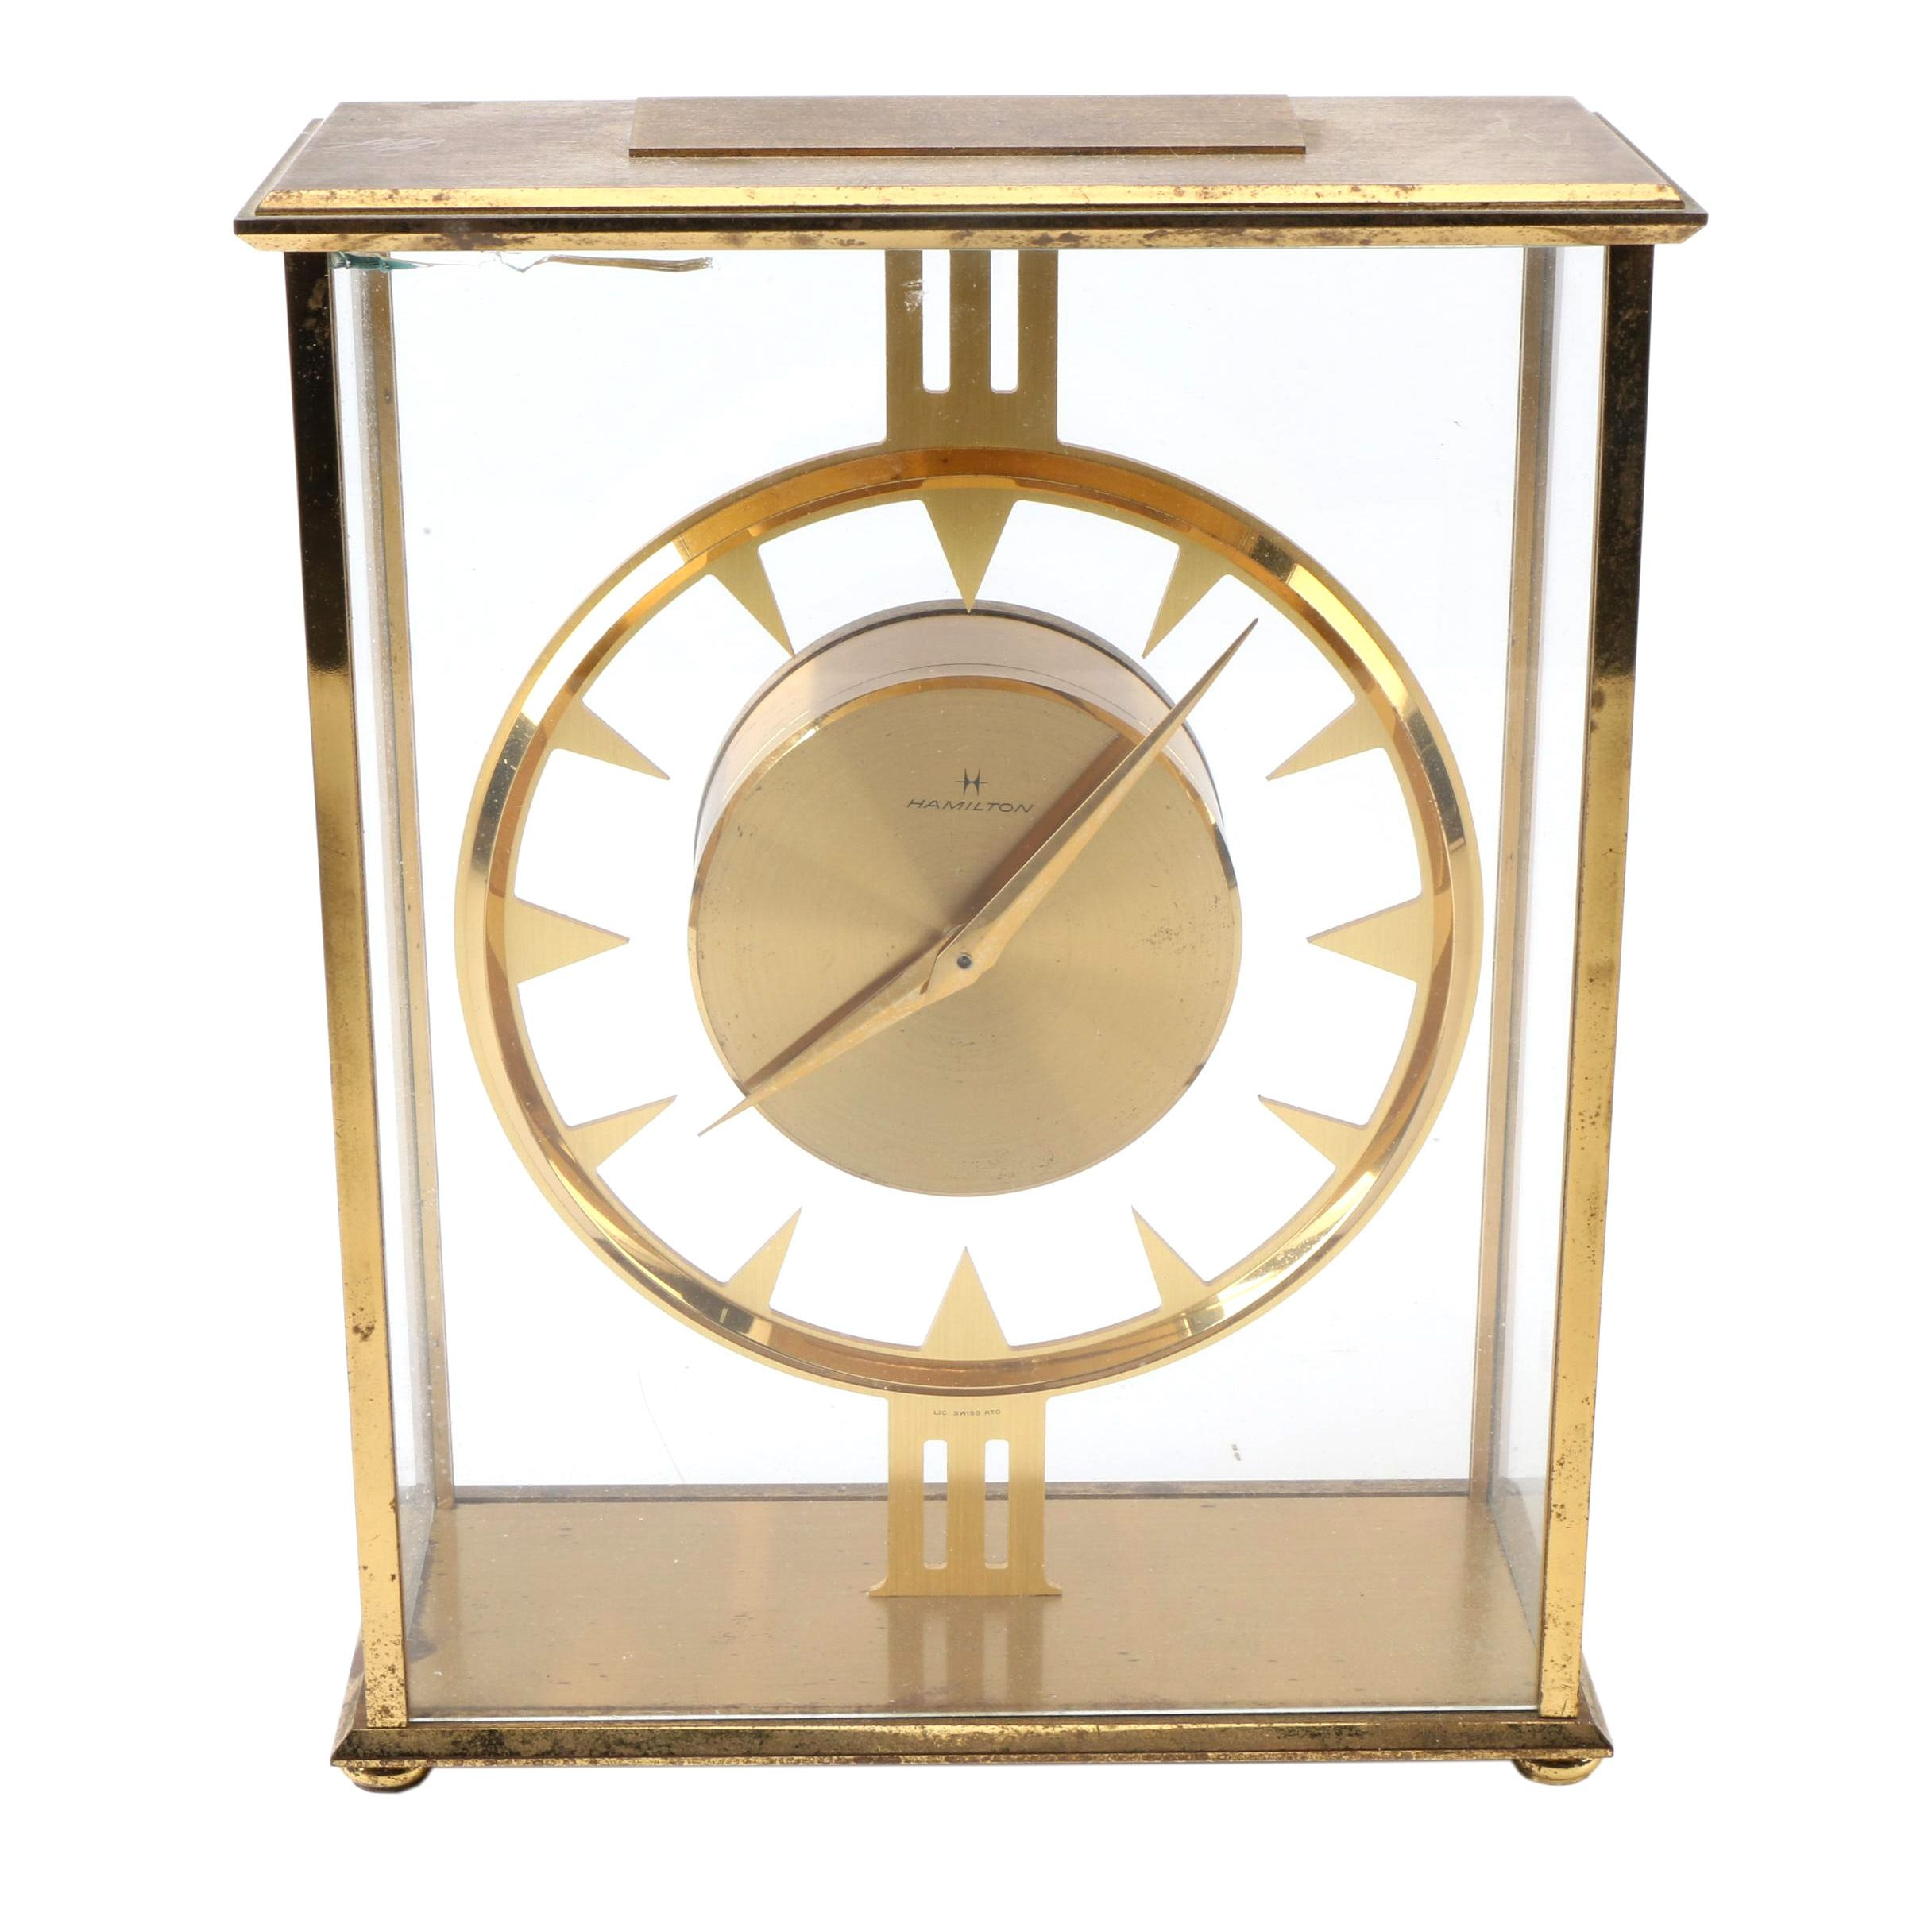 Hamilton Brass Quartz Desk Clock